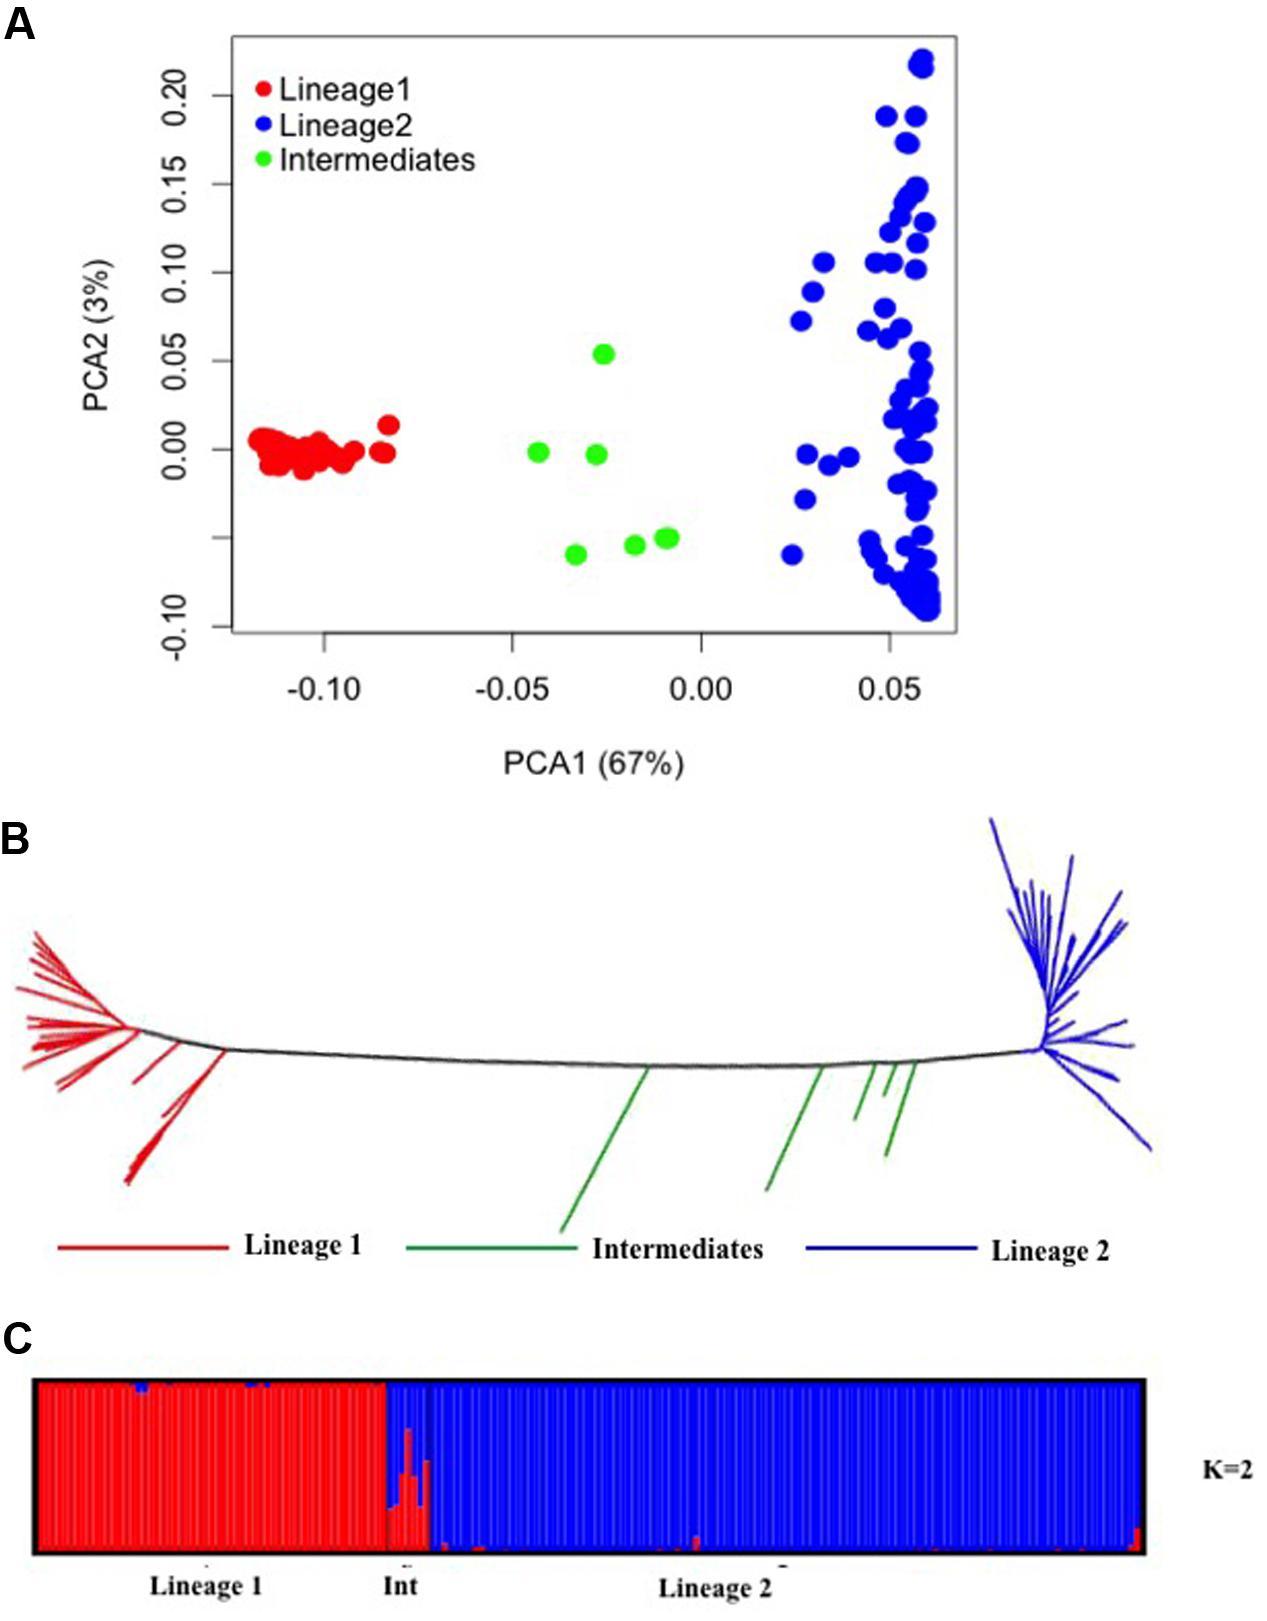 Frontiers | Genome-Wide Association Study of Grain